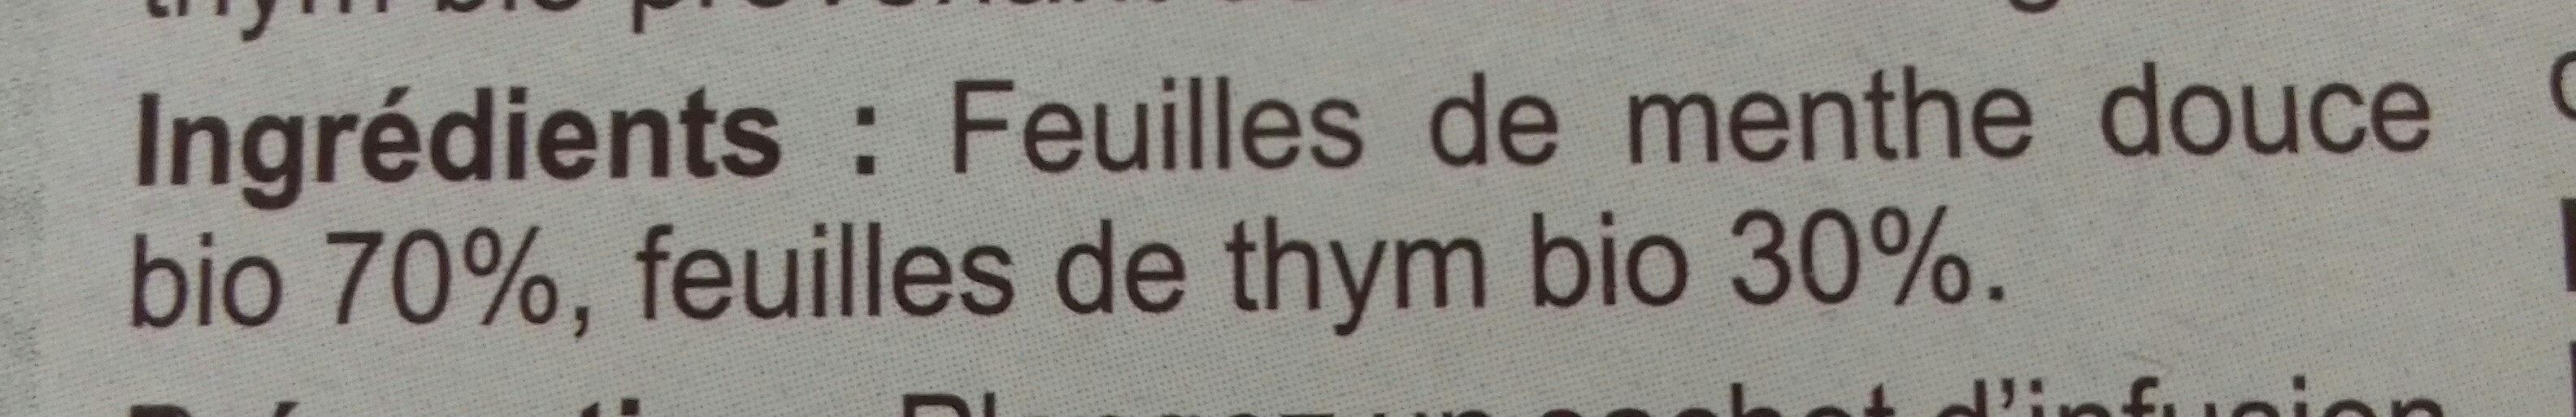 Infusion Menthe douce et thym Bio Carrefour - Voedingswaarden - fr